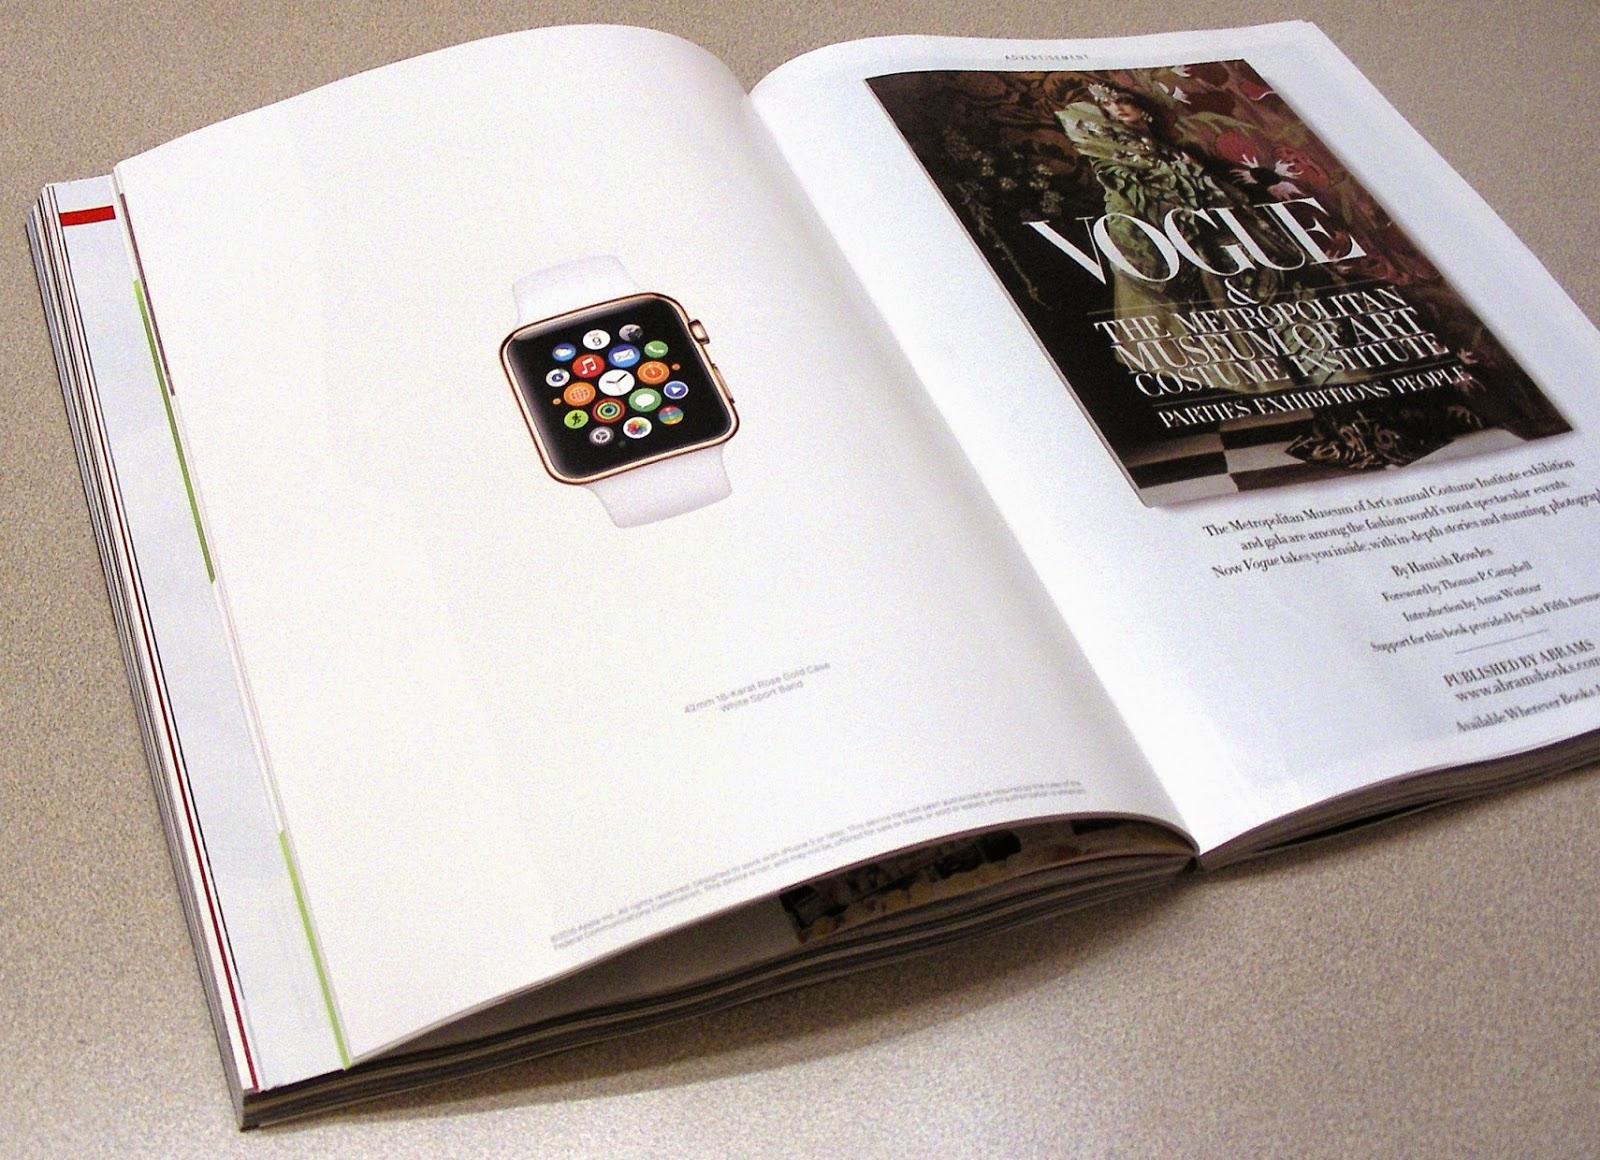 Tom's OSU: Woz on net neutrality and Apple watch apes 1977 ...